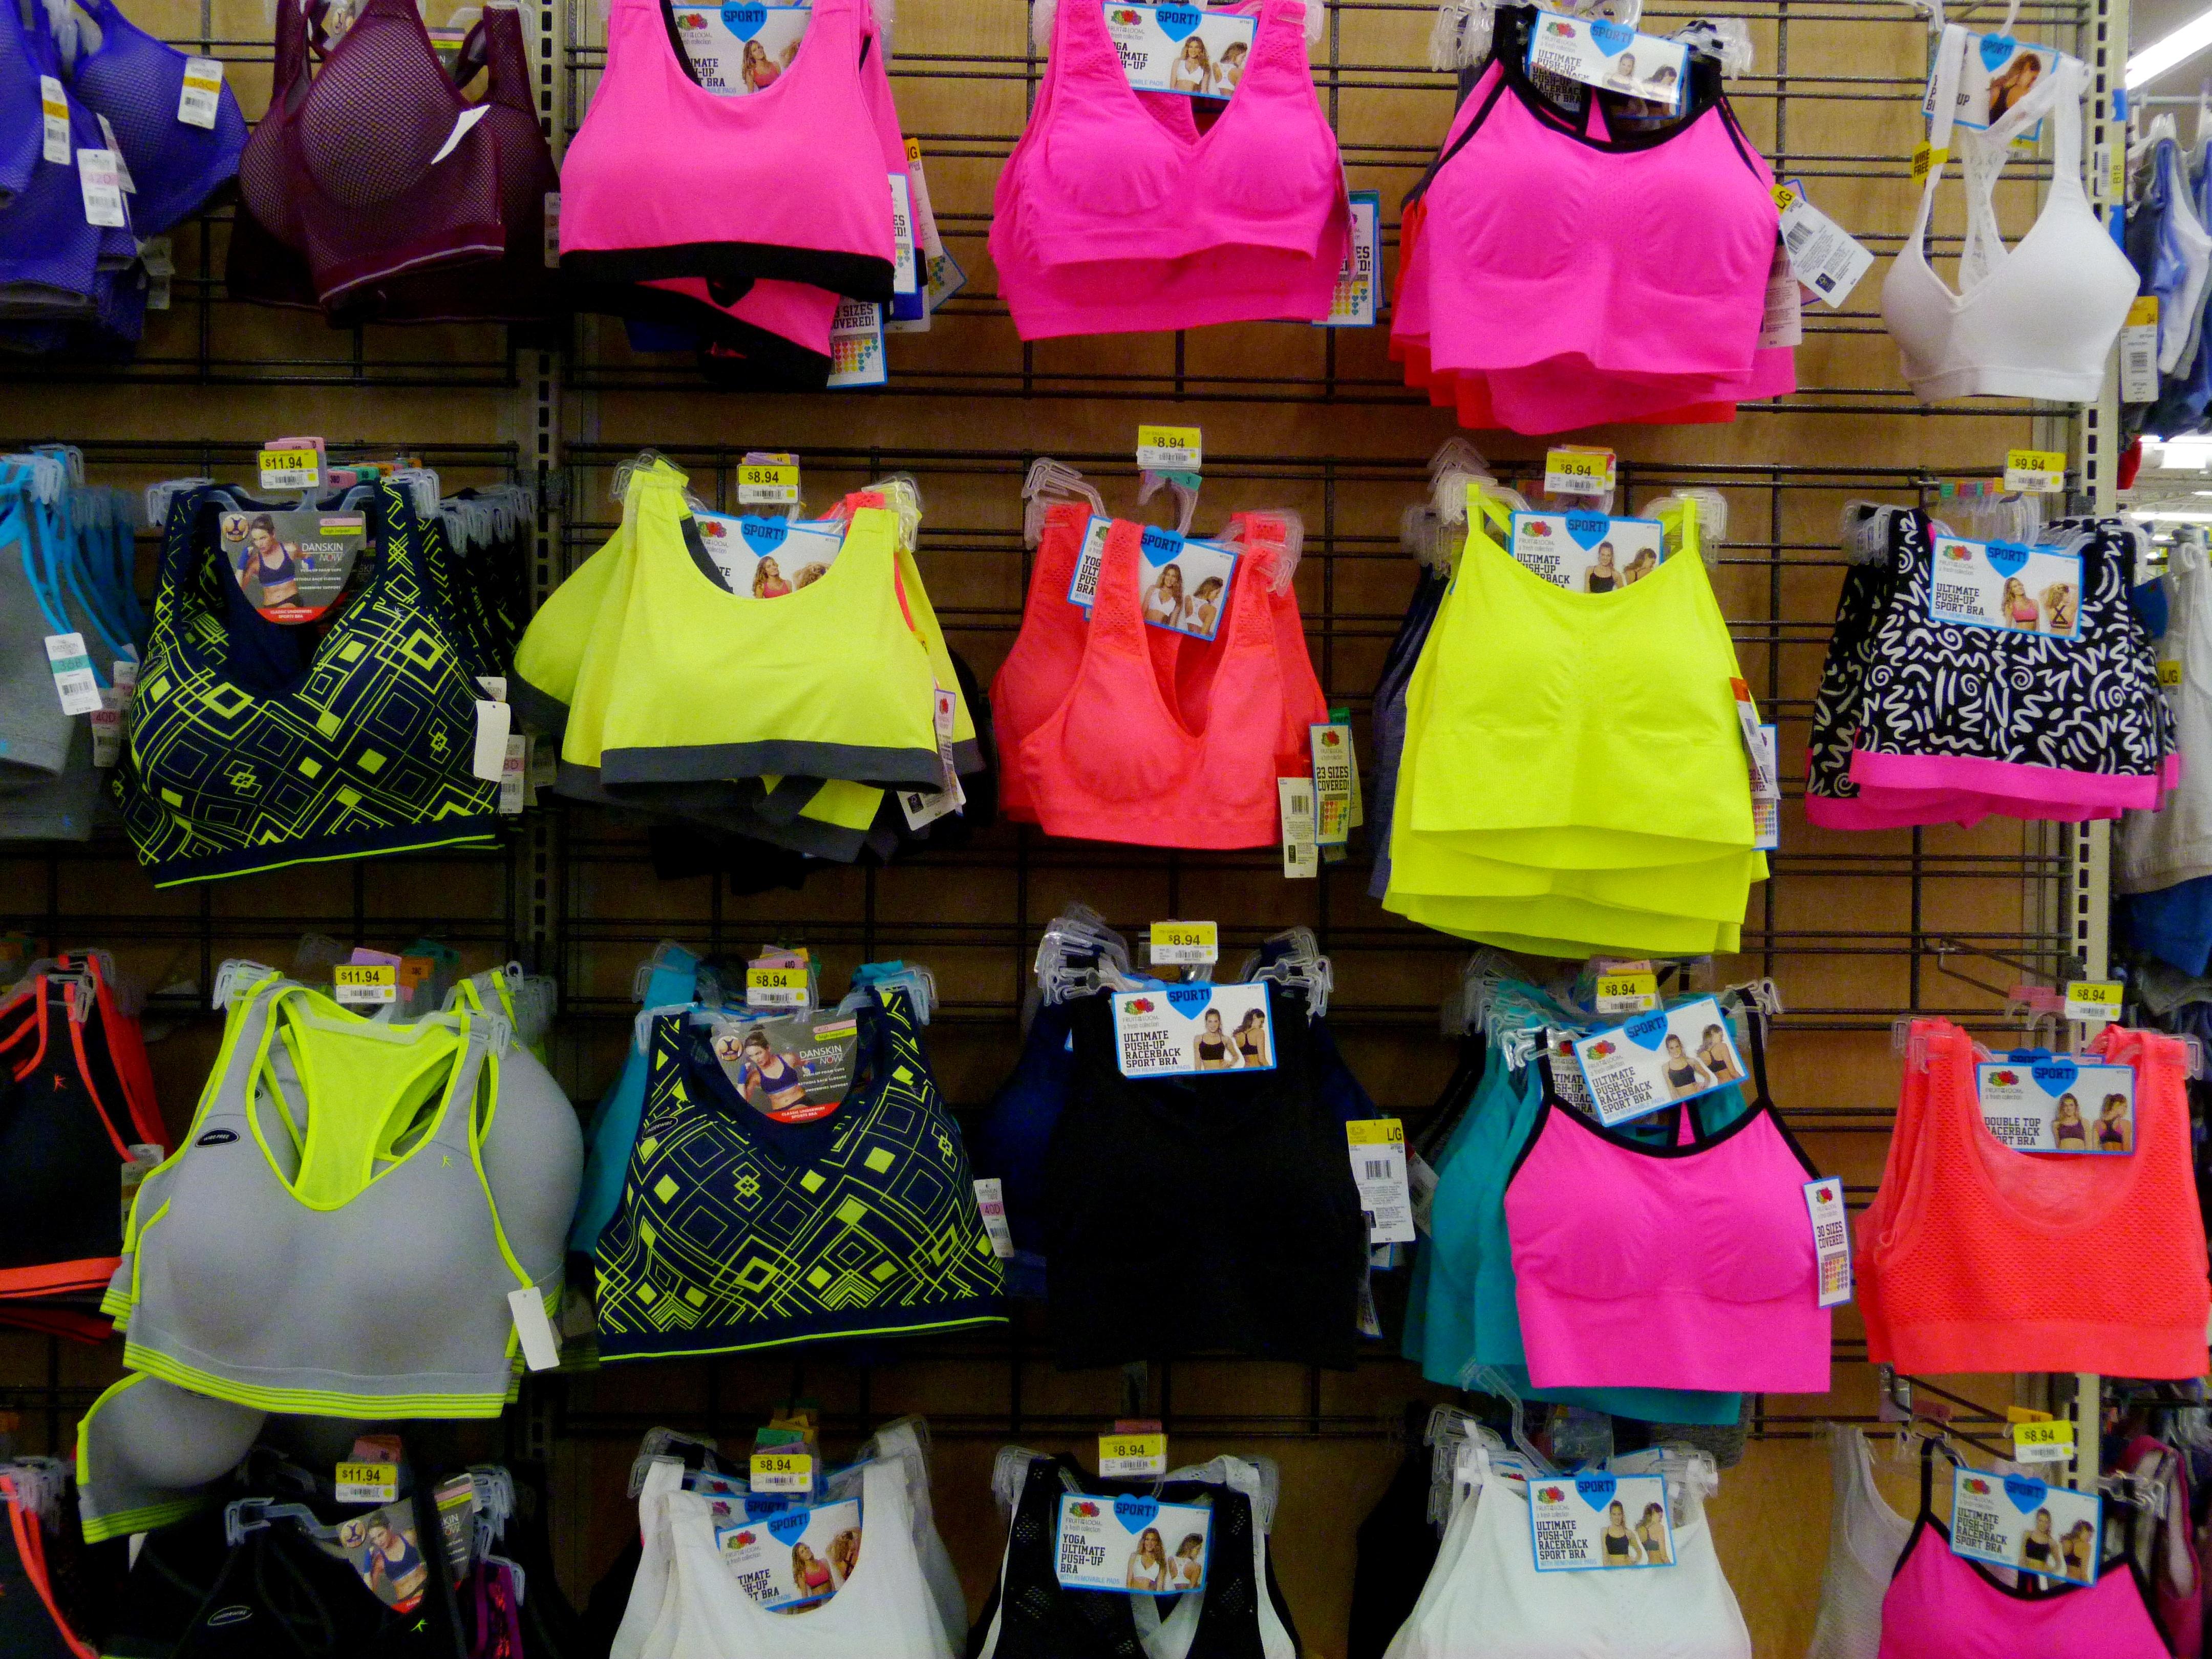 File:Colorful sports bras in Walmart.jpg - Wikimedia Commons